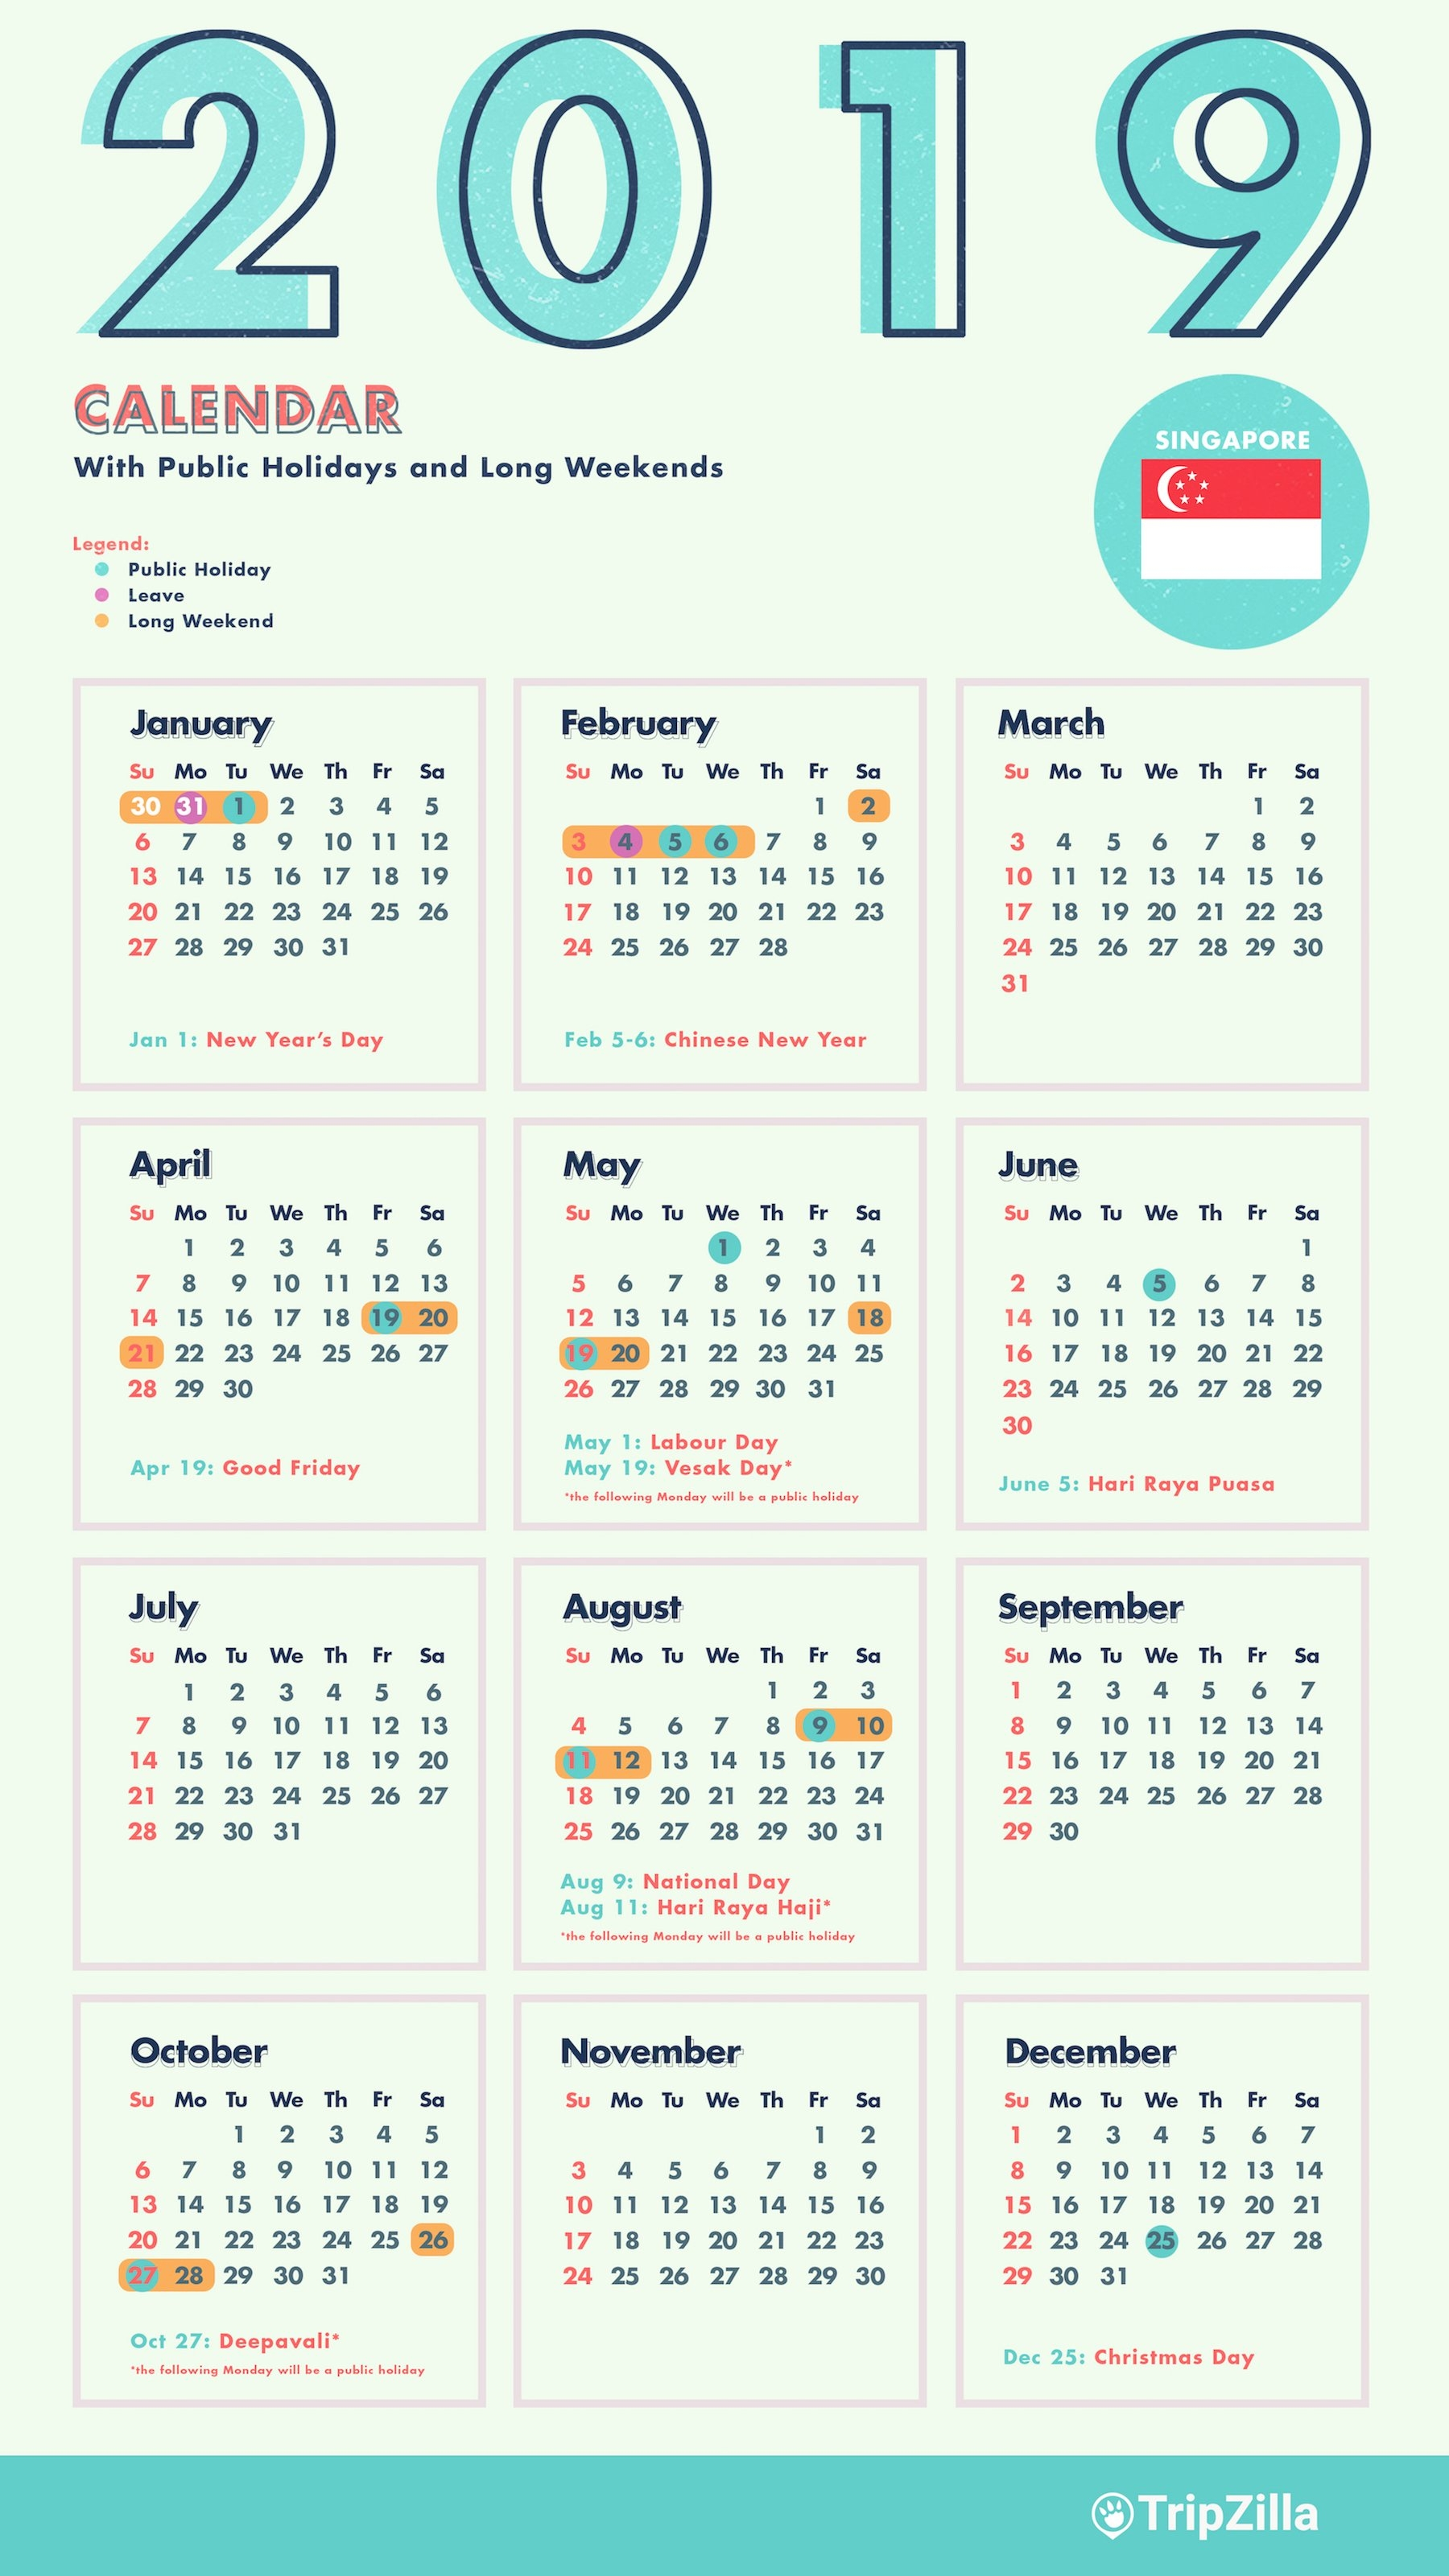 6 Long Weekends In Singapore In 2019 (Bonus Calendar & Cheatsheet) Calendar 2019 Ramadan